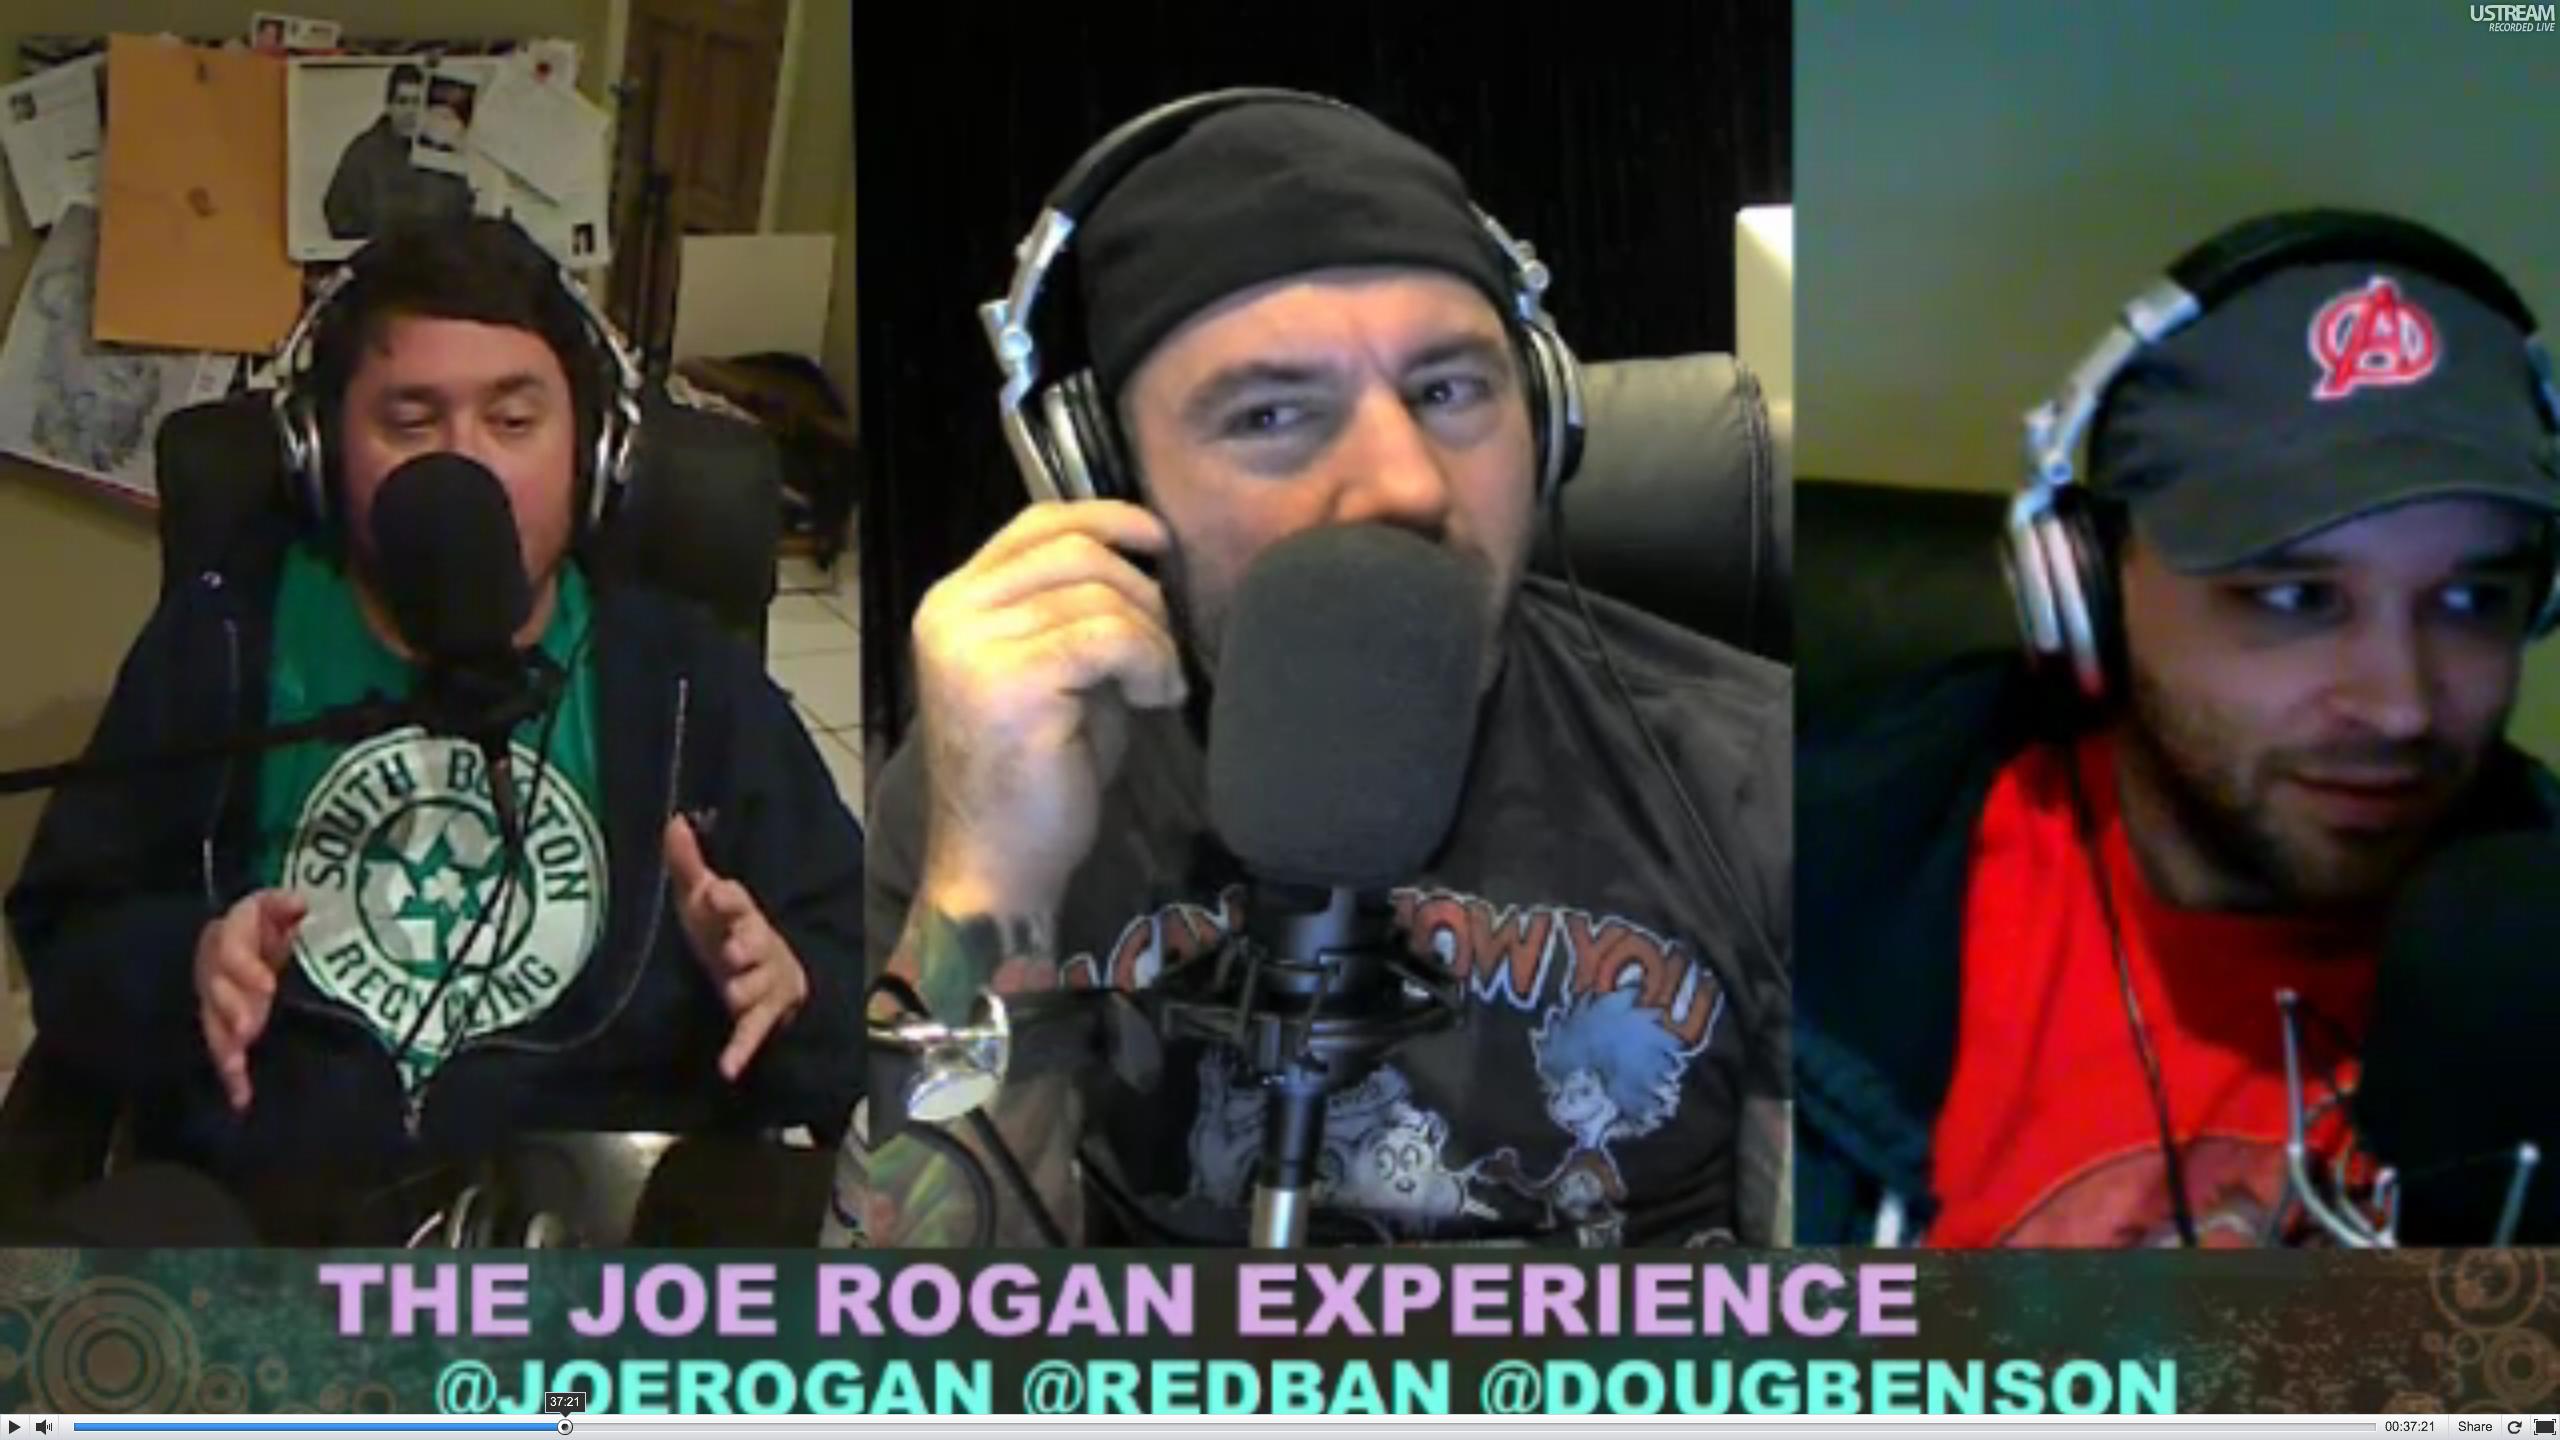 The Joe Rogan Experience PODCAST #158 - Doug Benson, Brian Redban